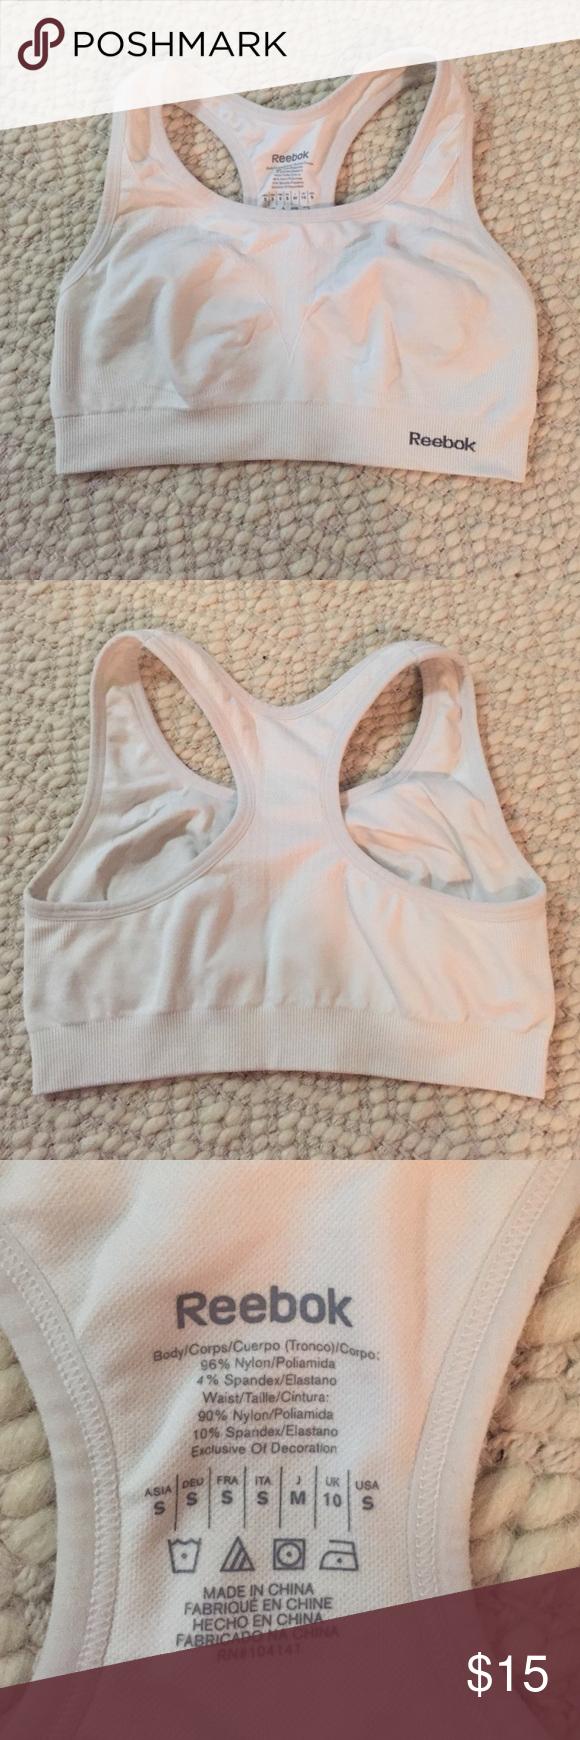 Reebok white sports bra Reebok white sports bra, halter back Reebok Intimates & Sleepwear Bras